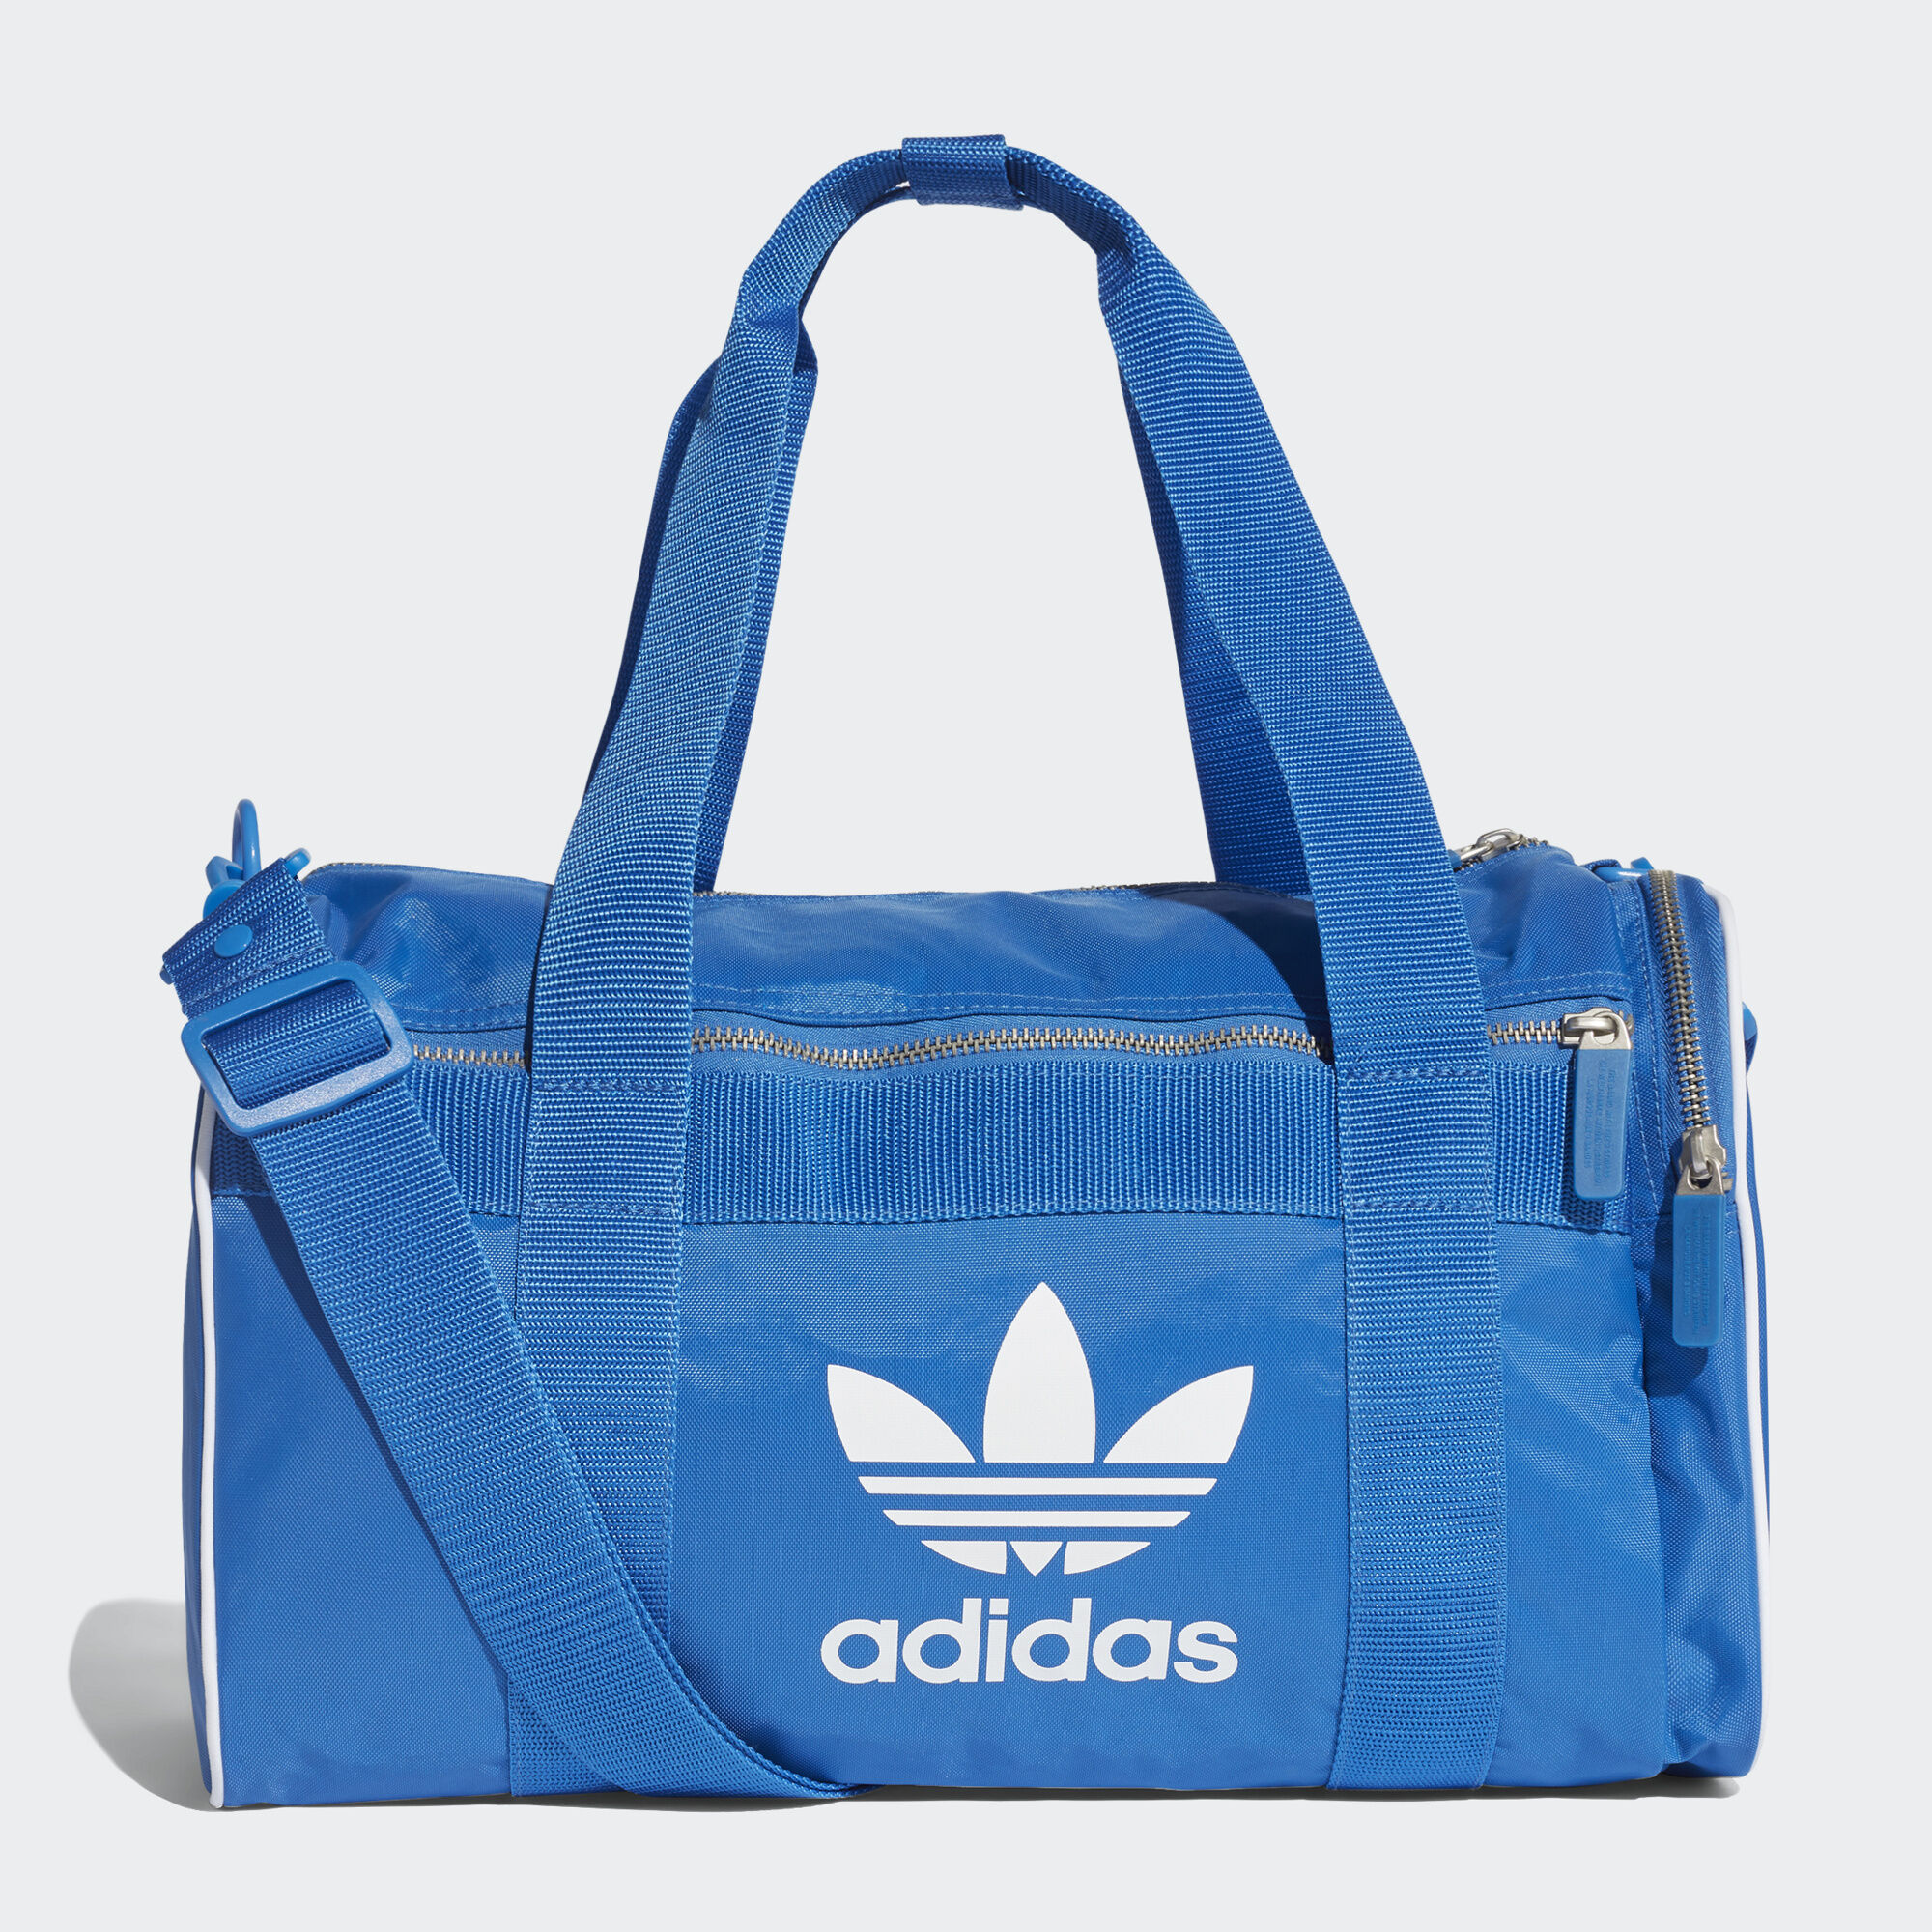 Bolsa Blue Mediana Adidas Regional Viaje De qZrAqO